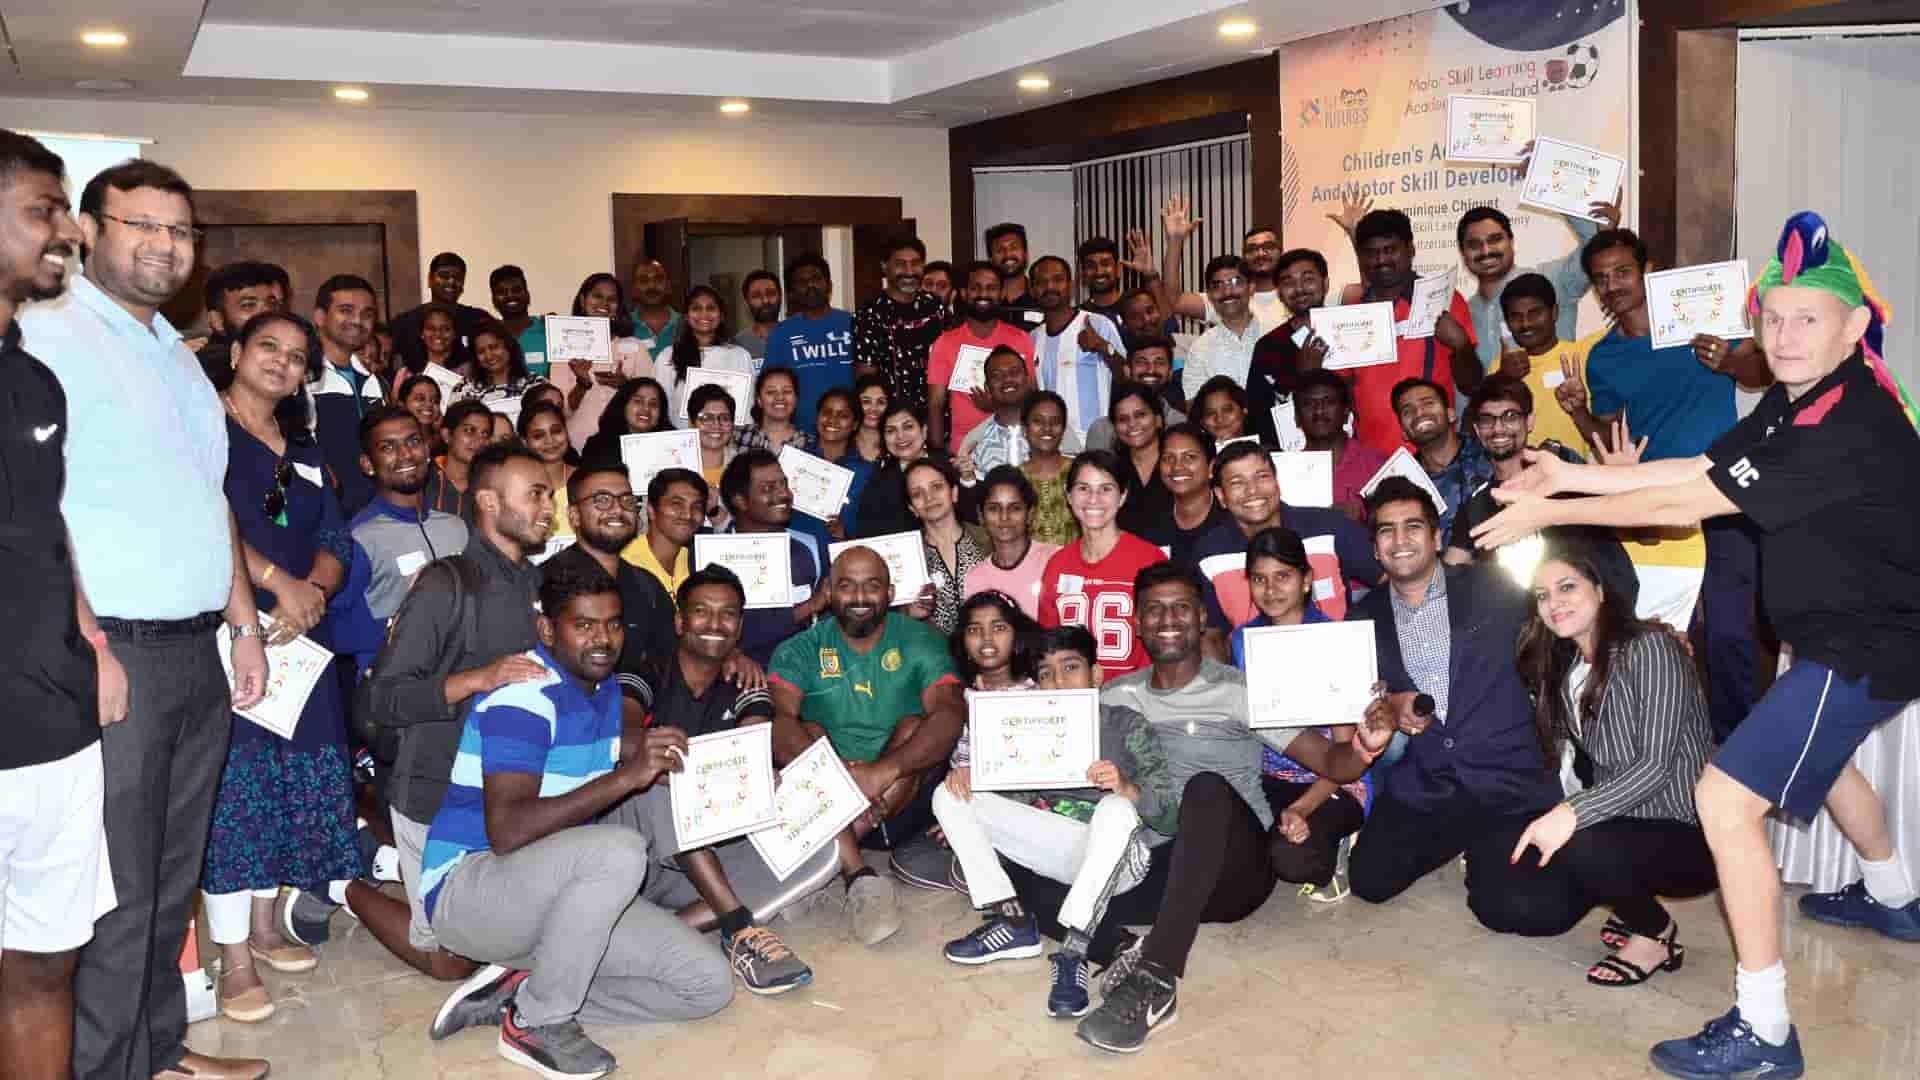 MotorSkillLearning Workshop Bangalore